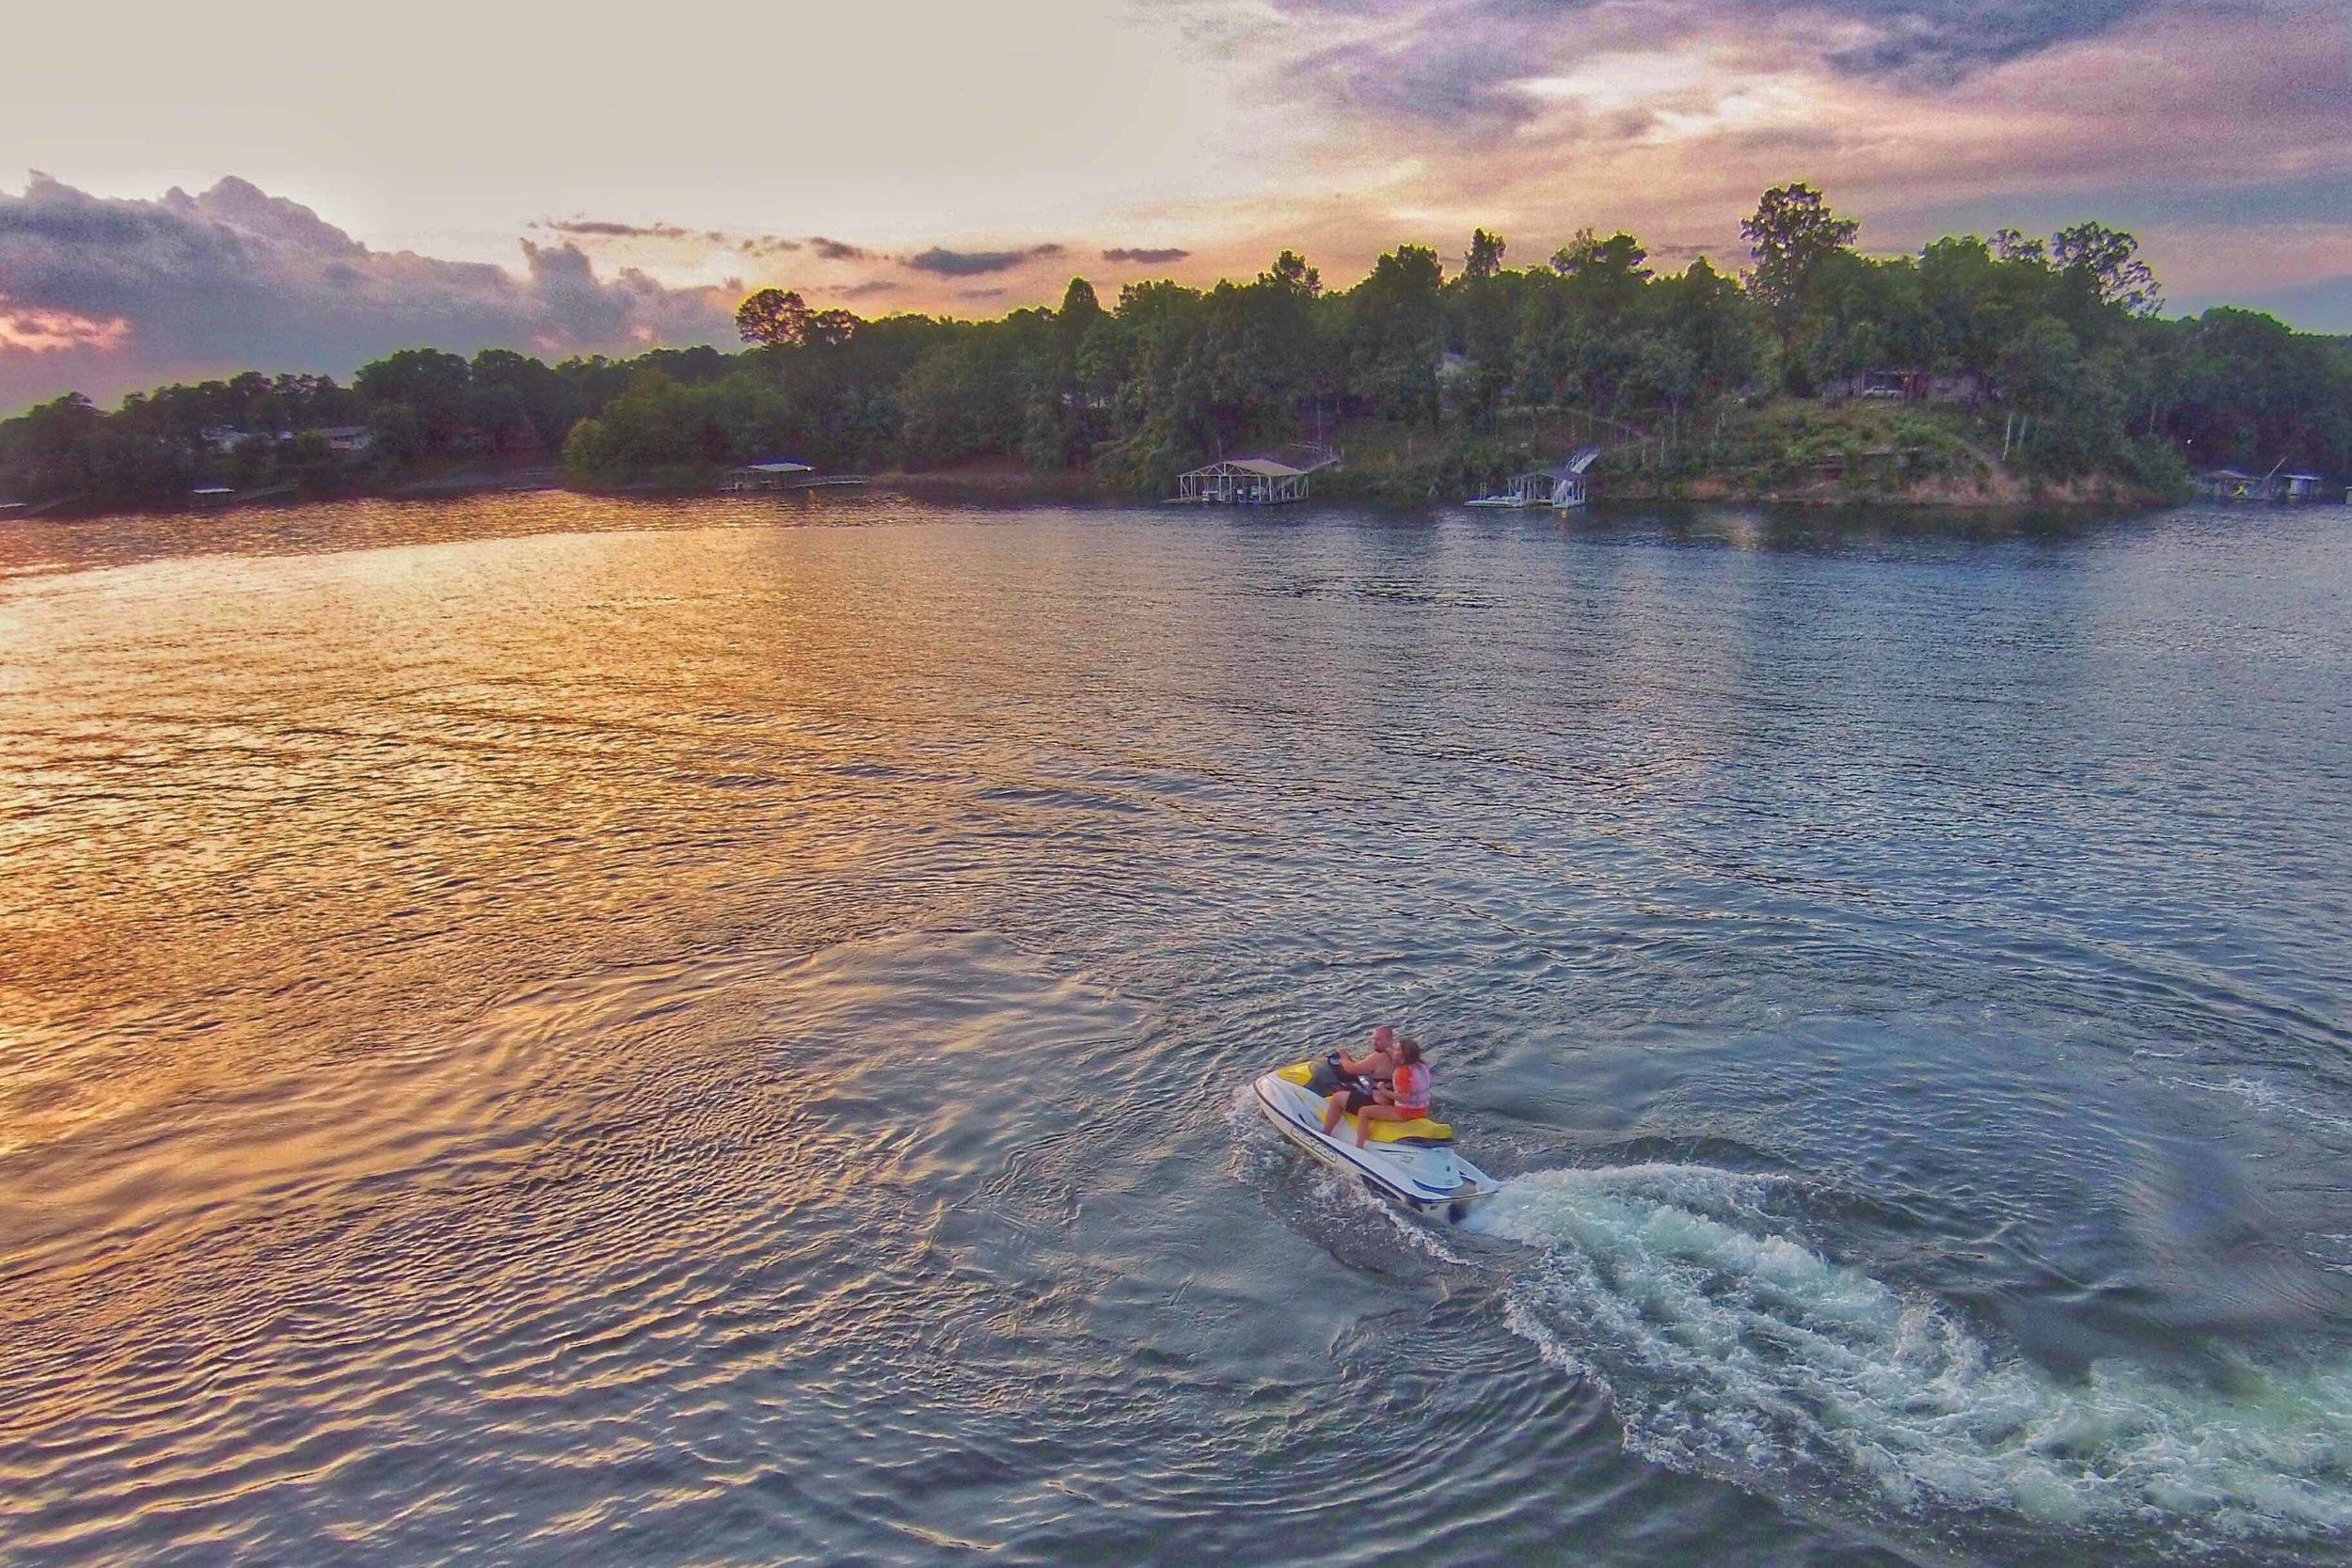 Sunset Jet Ski Ride on Smith Lake